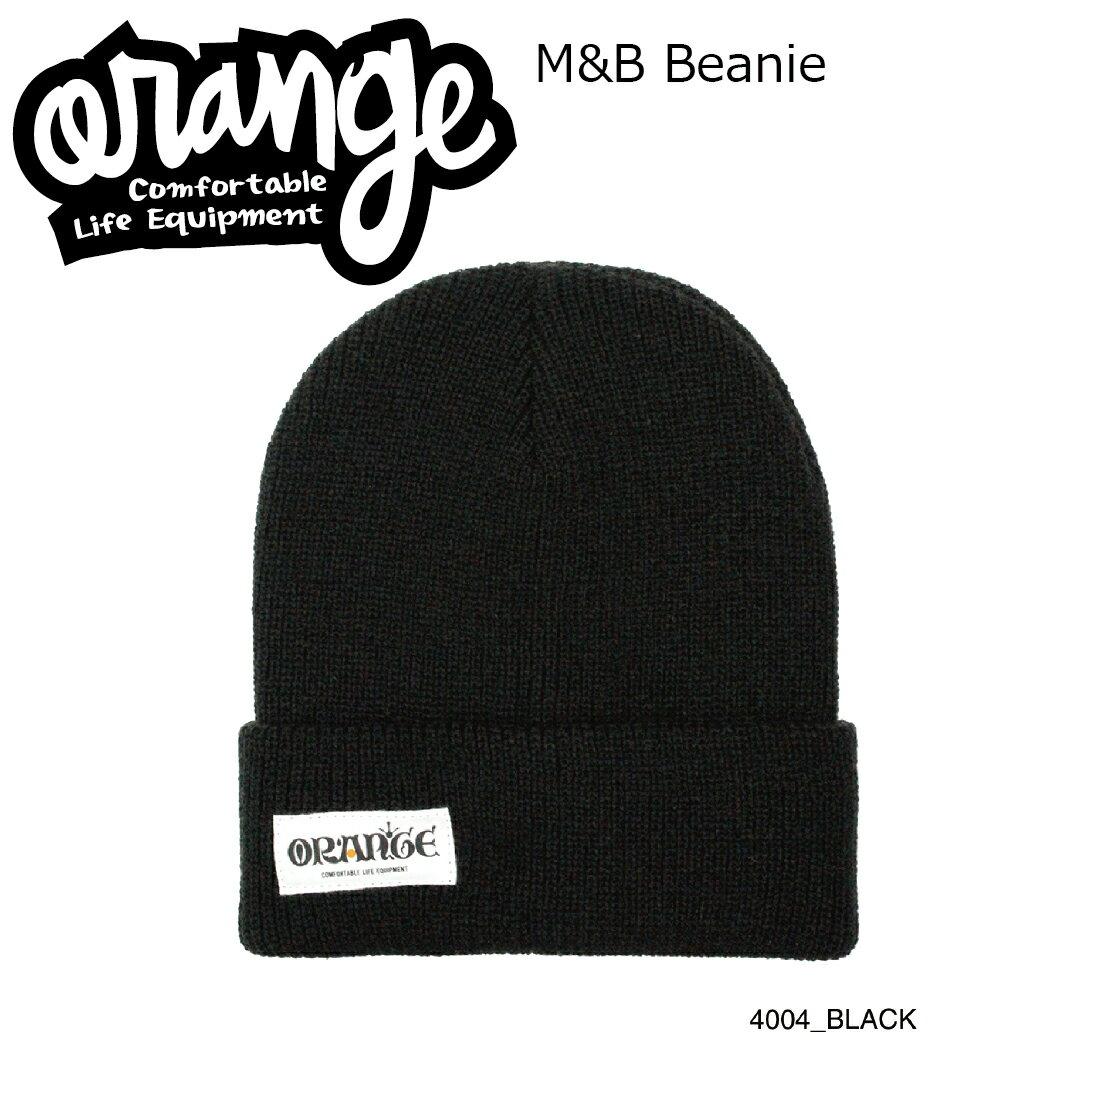 Oran'ge M&B Beanie 4004 BLACK オレンジ エムアンドビー ビーニー ニットキャップ 2つ折り